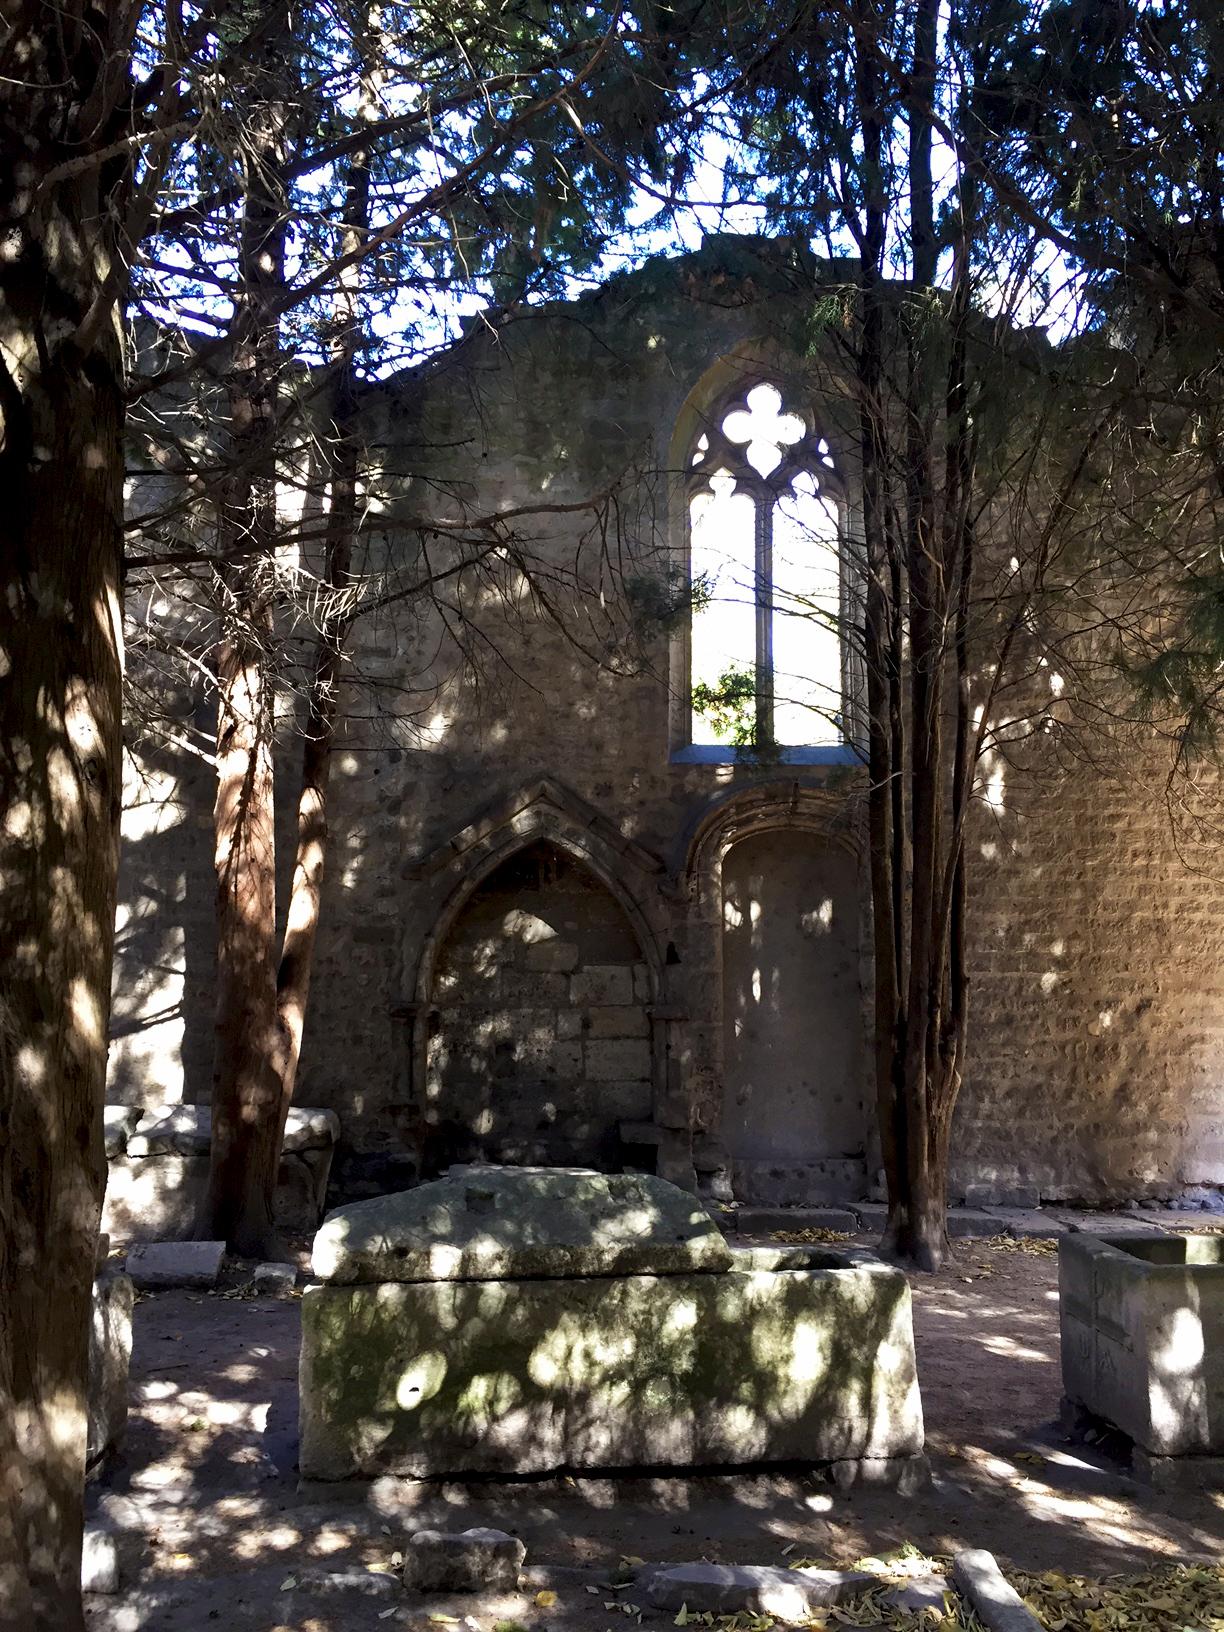 Courtyard at Saint-Honorat